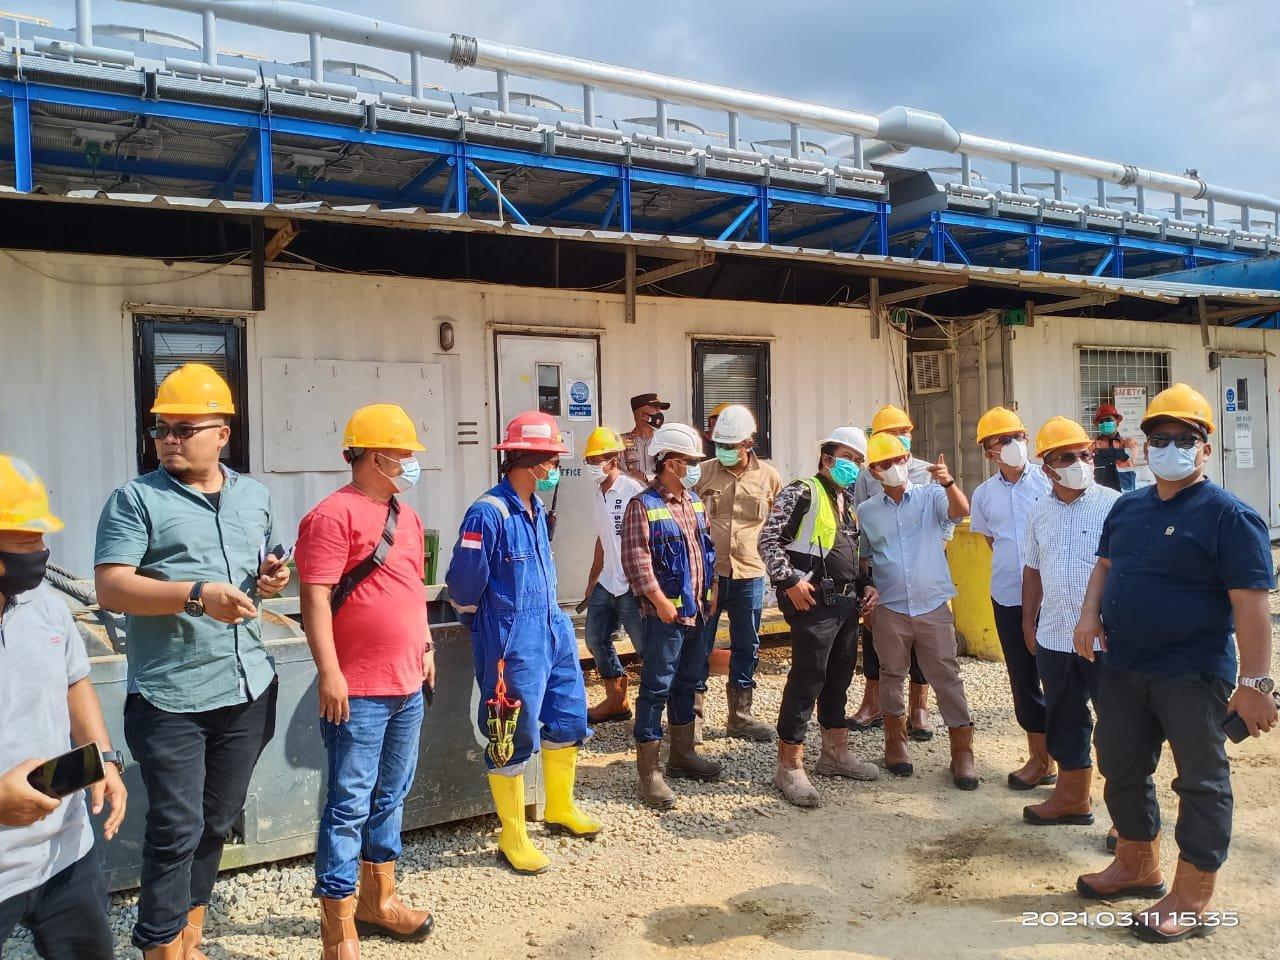 Pansus DPRD Madina Kunjungi PT SMGP, Amati Proses Pengeboran dan Limbah Perusahaan